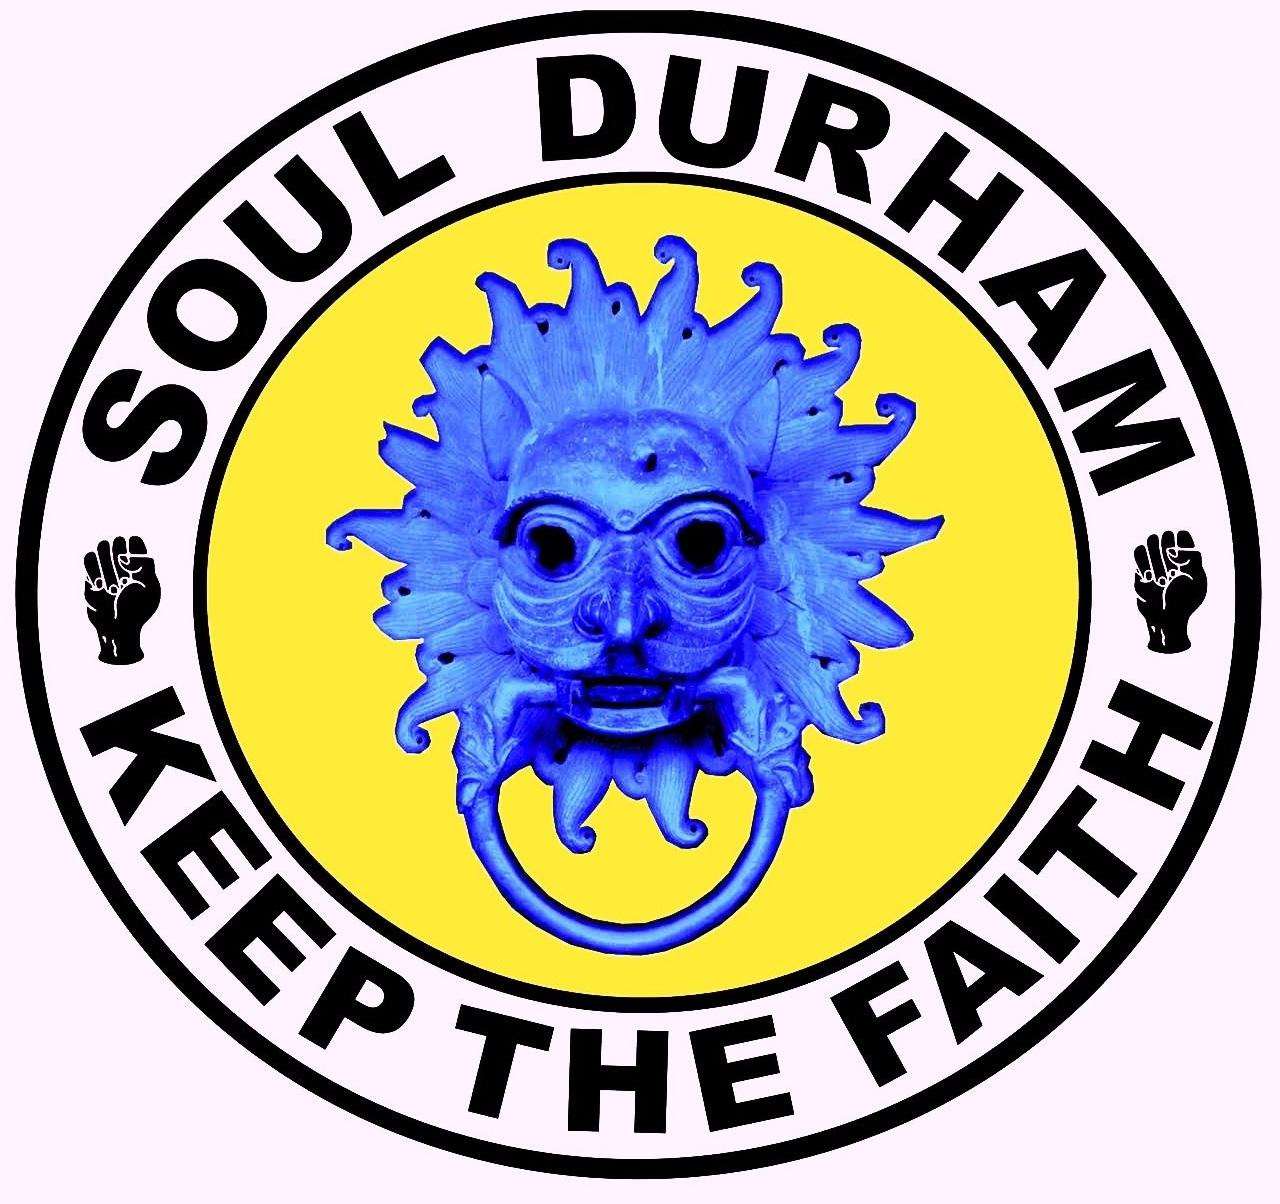 Soul In Durham  The Hetton Centre flyer